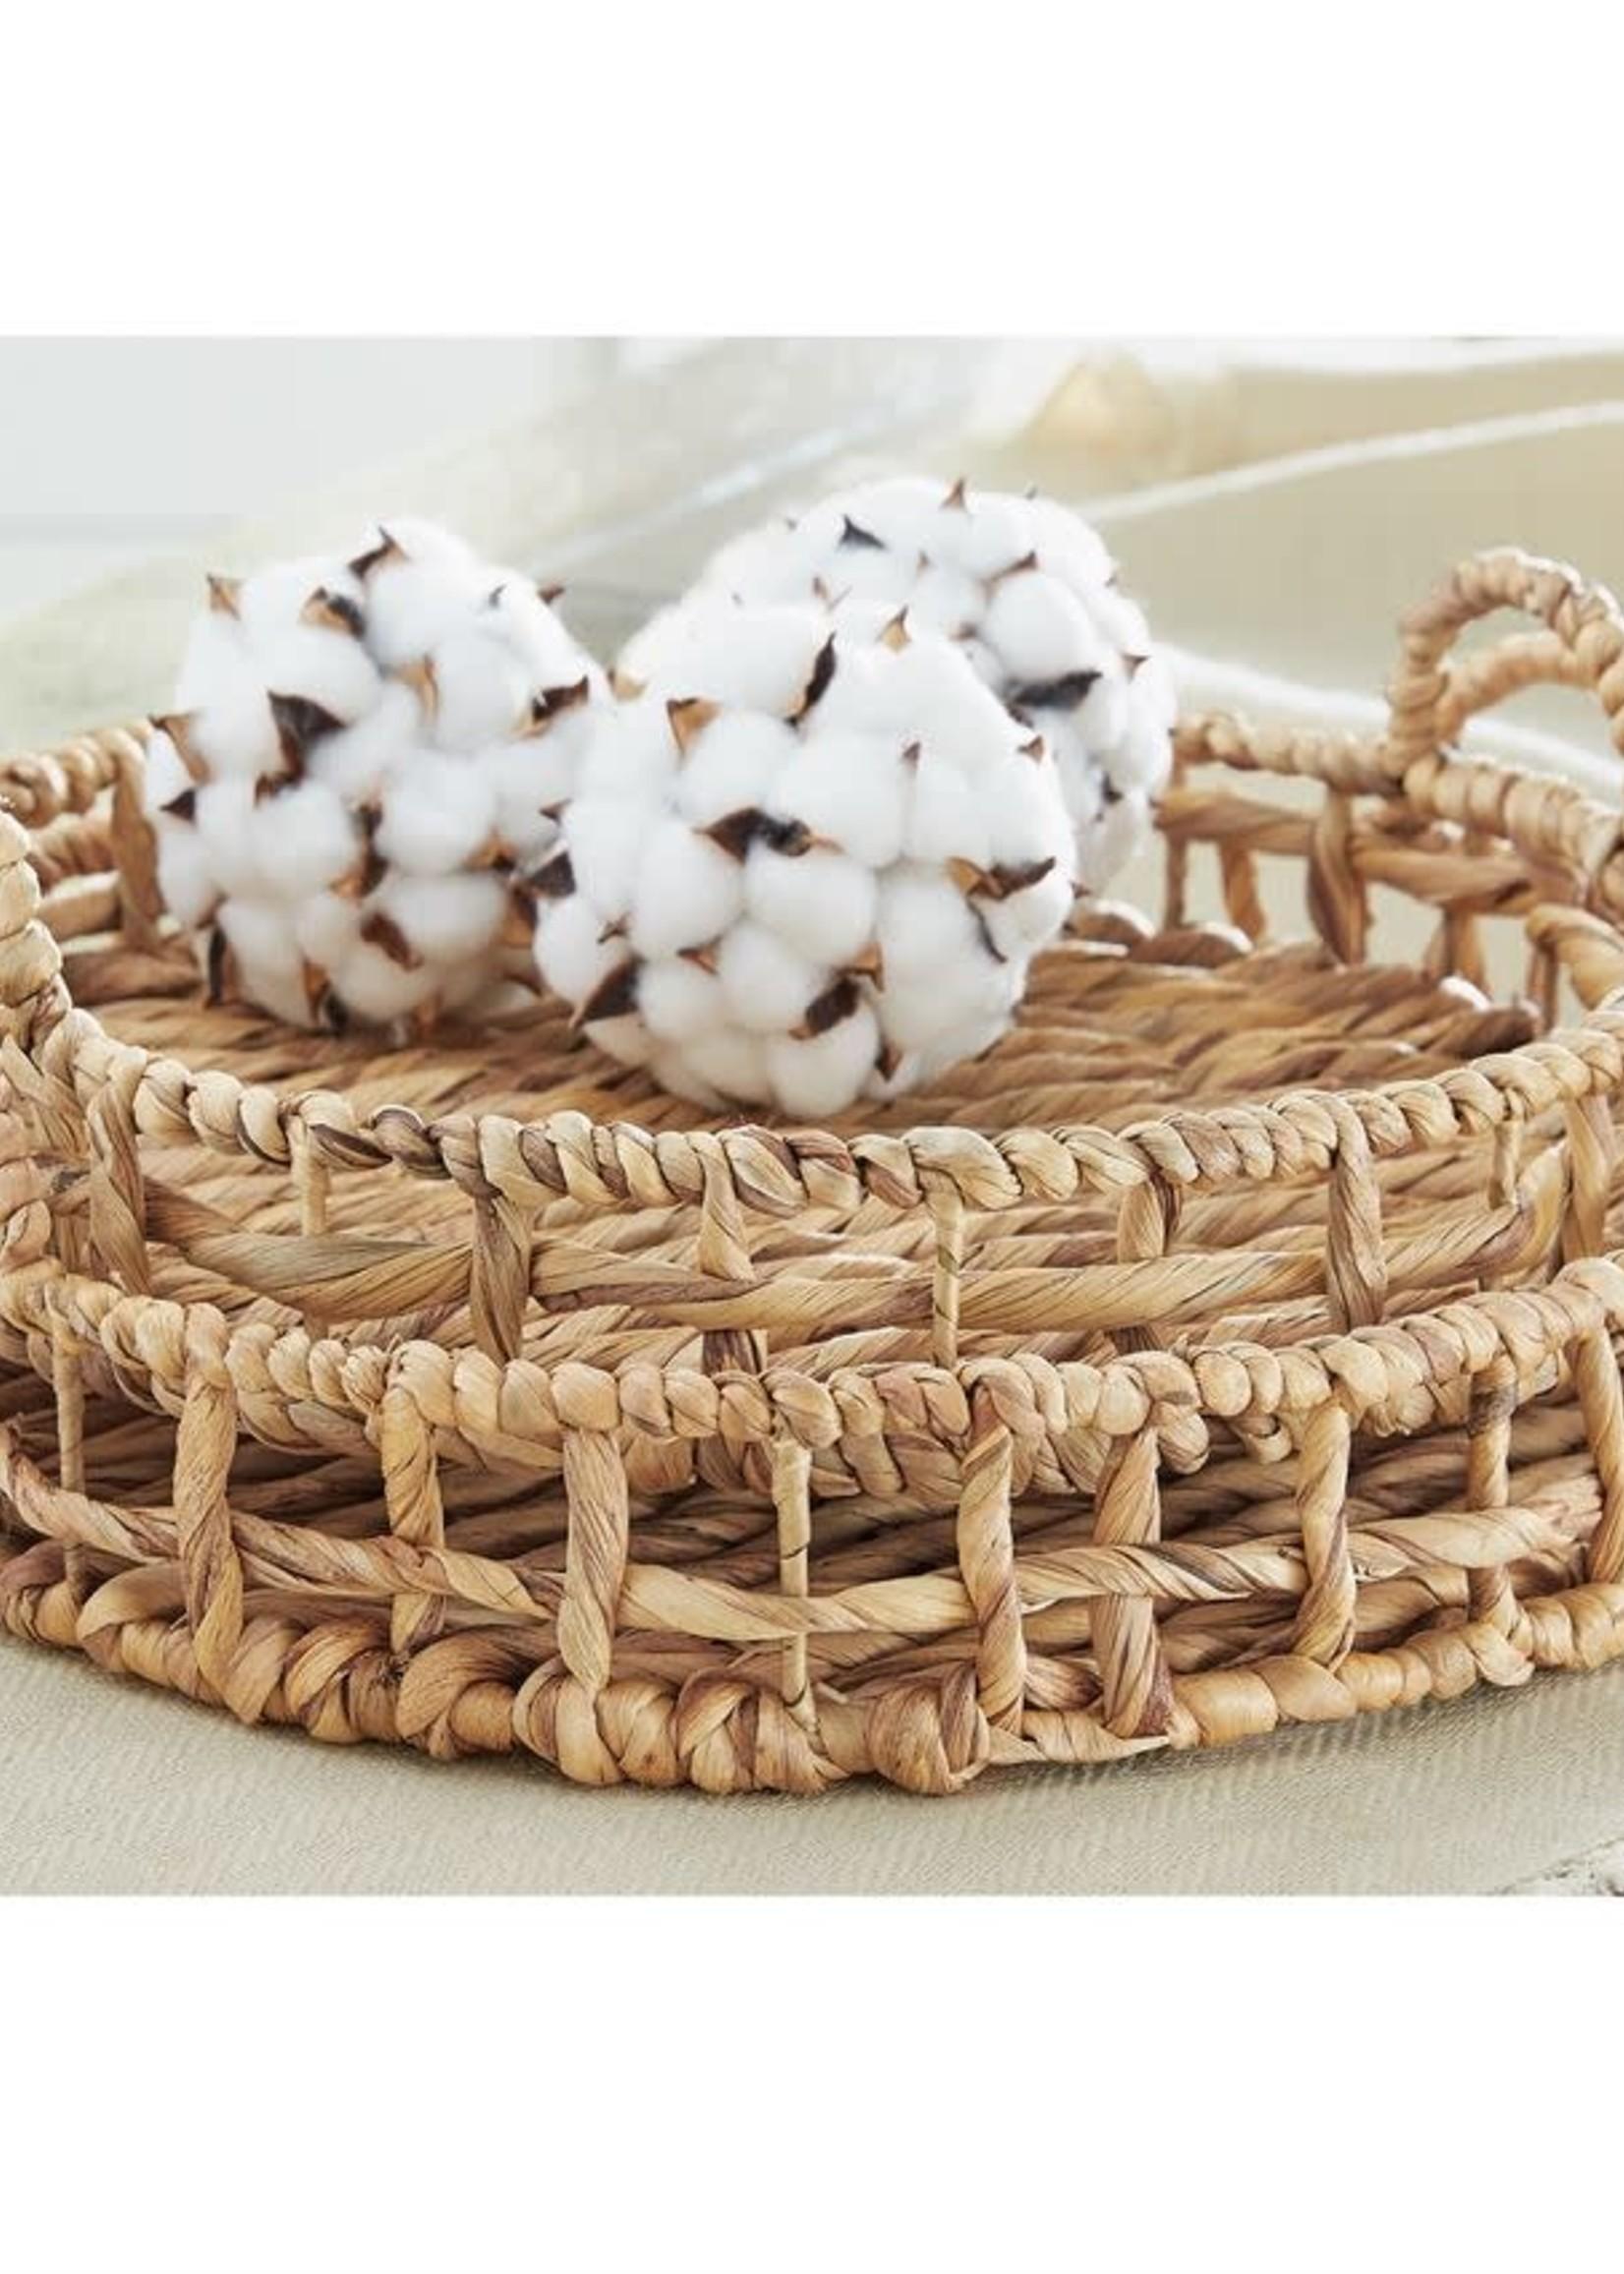 Mud Pie Artificial Cotton Ball